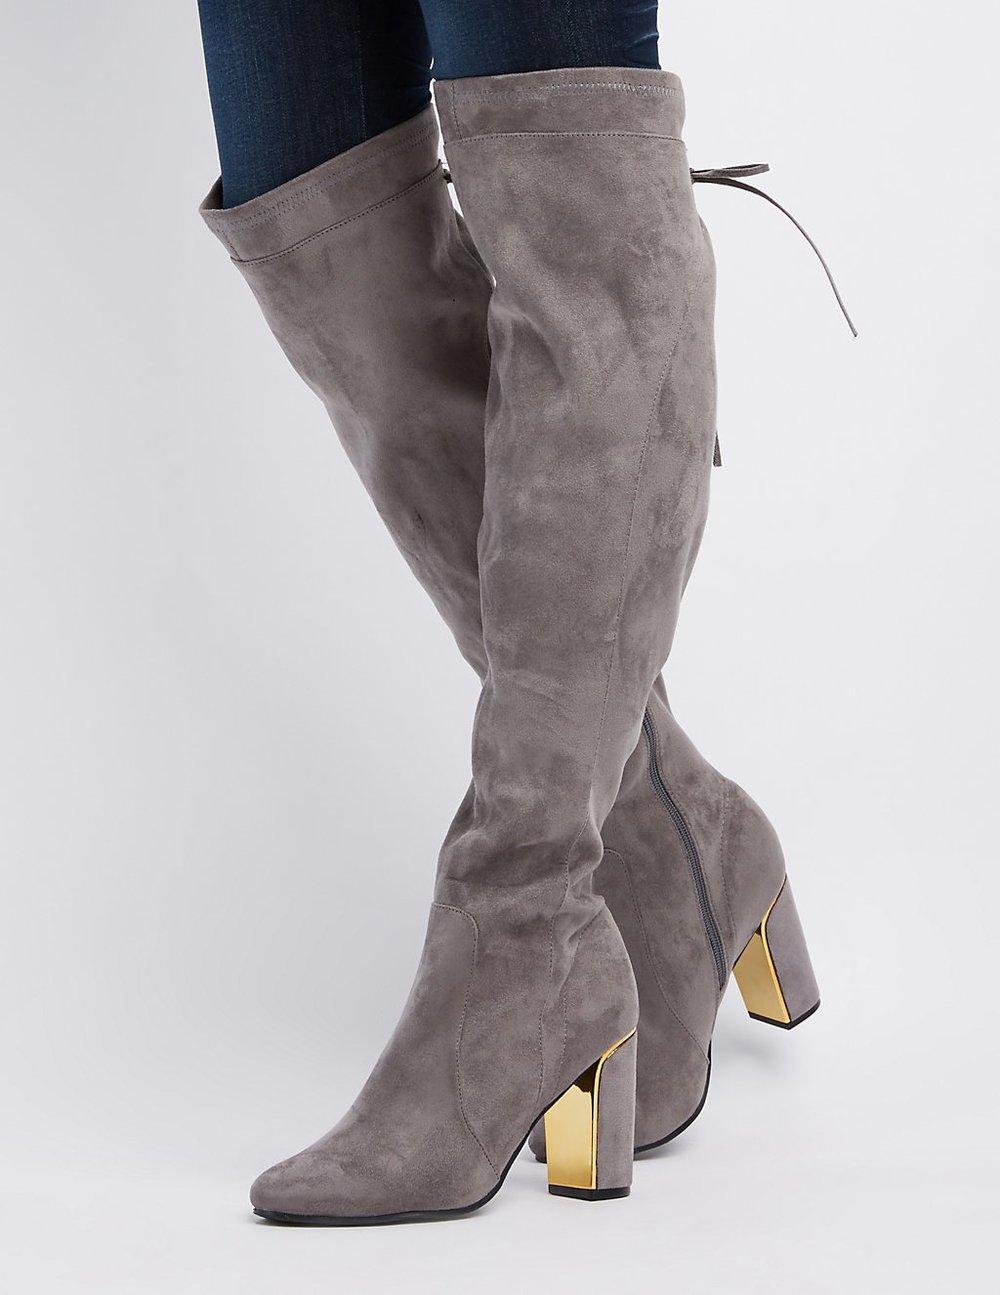 black friday sales charlotte russe otk boots grey gold